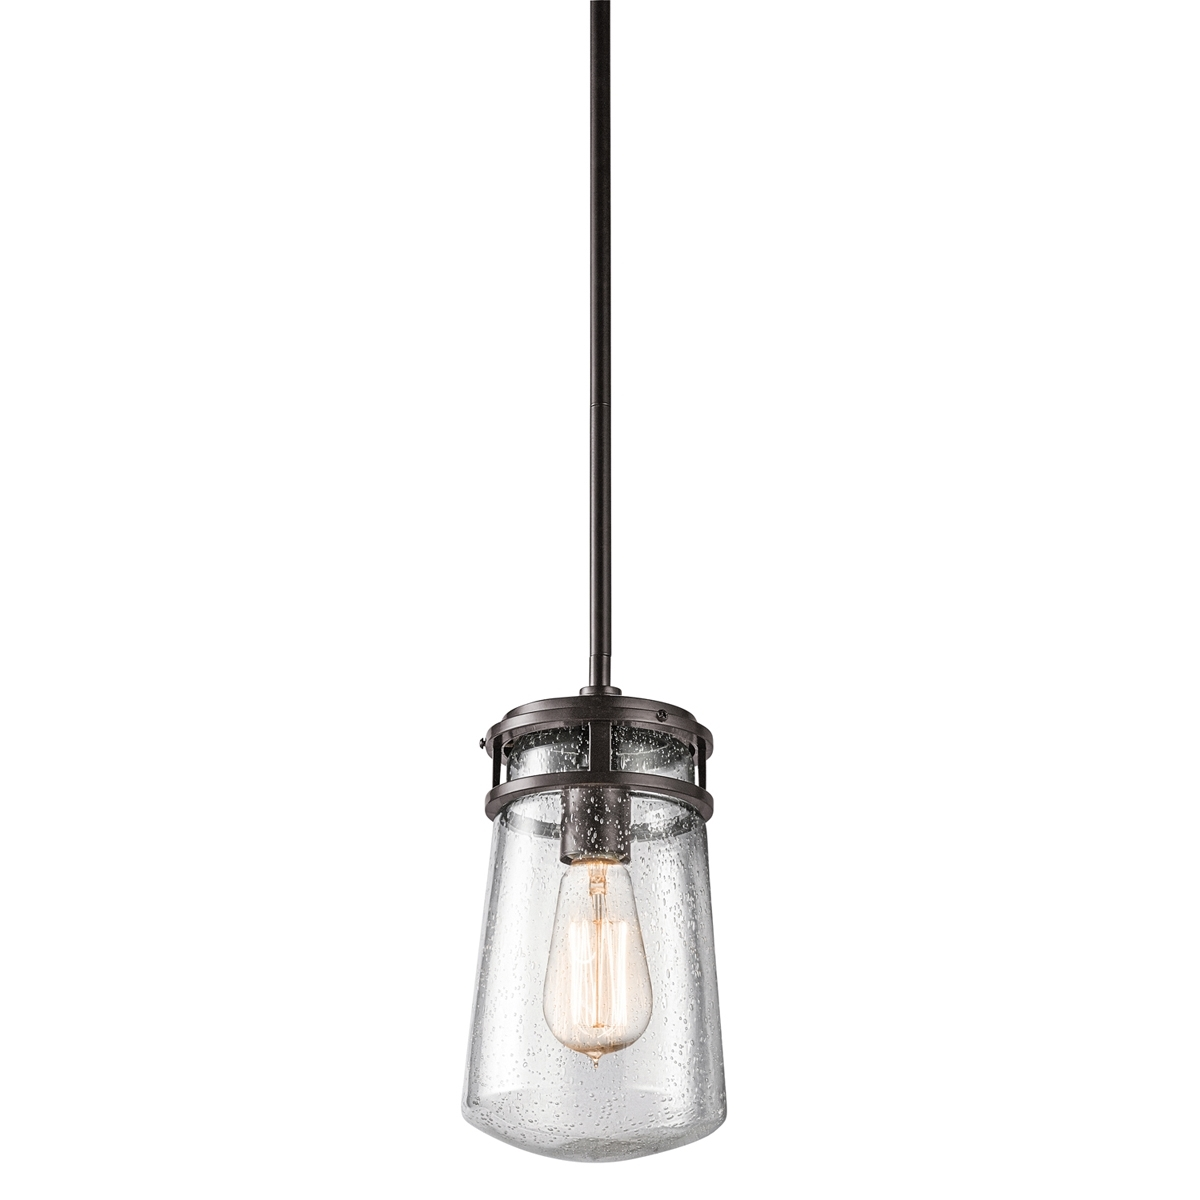 Nautical, Outdoor Hanging Lights, Outdoor Lights – Lamps Expo With Famous Outdoor Hanging Light Fixtures In Black (View 10 of 20)